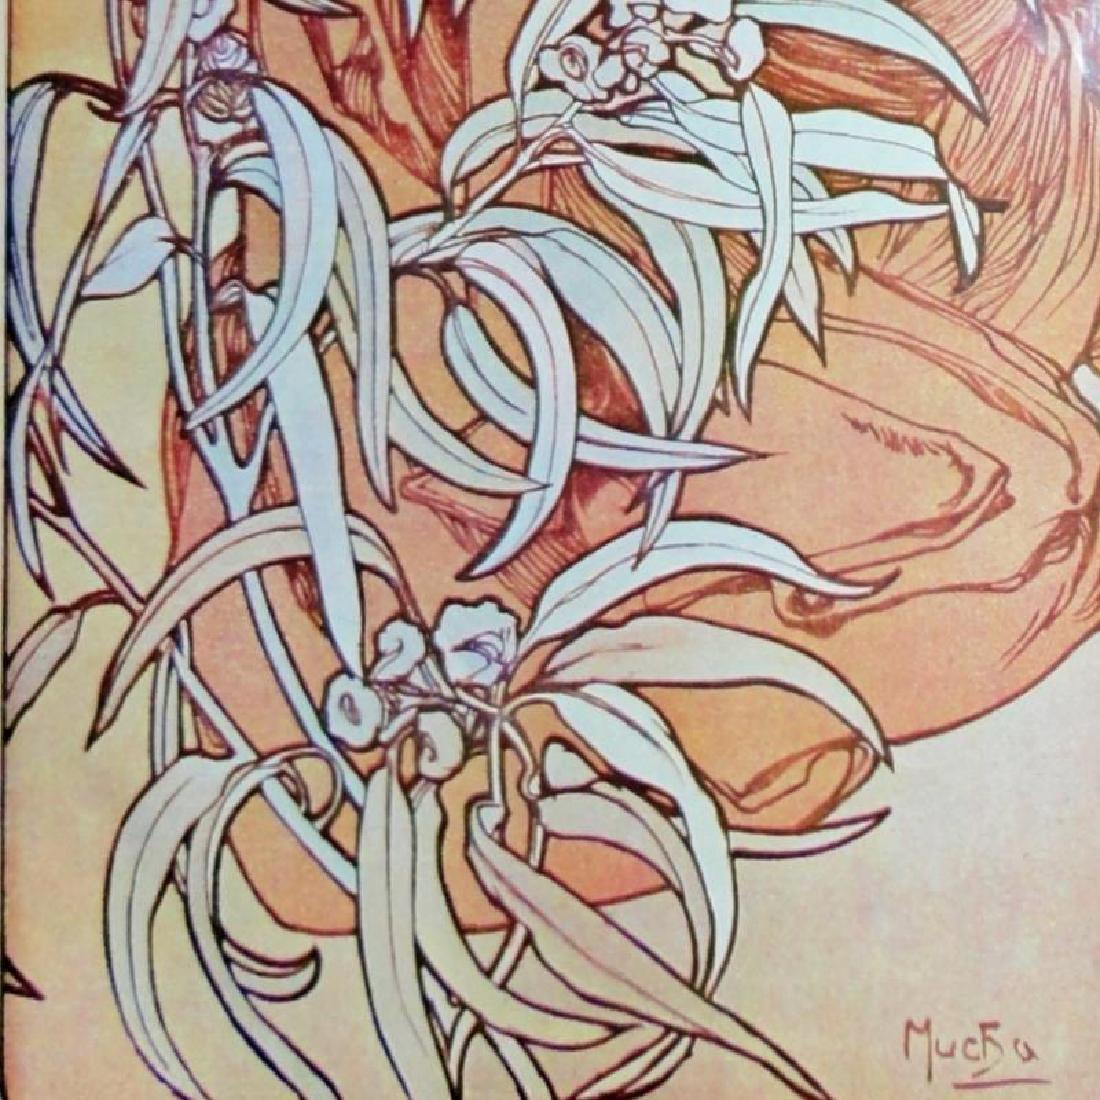 3 Large Mucha Repro Antique Poster Art Prints 48X18 - 9